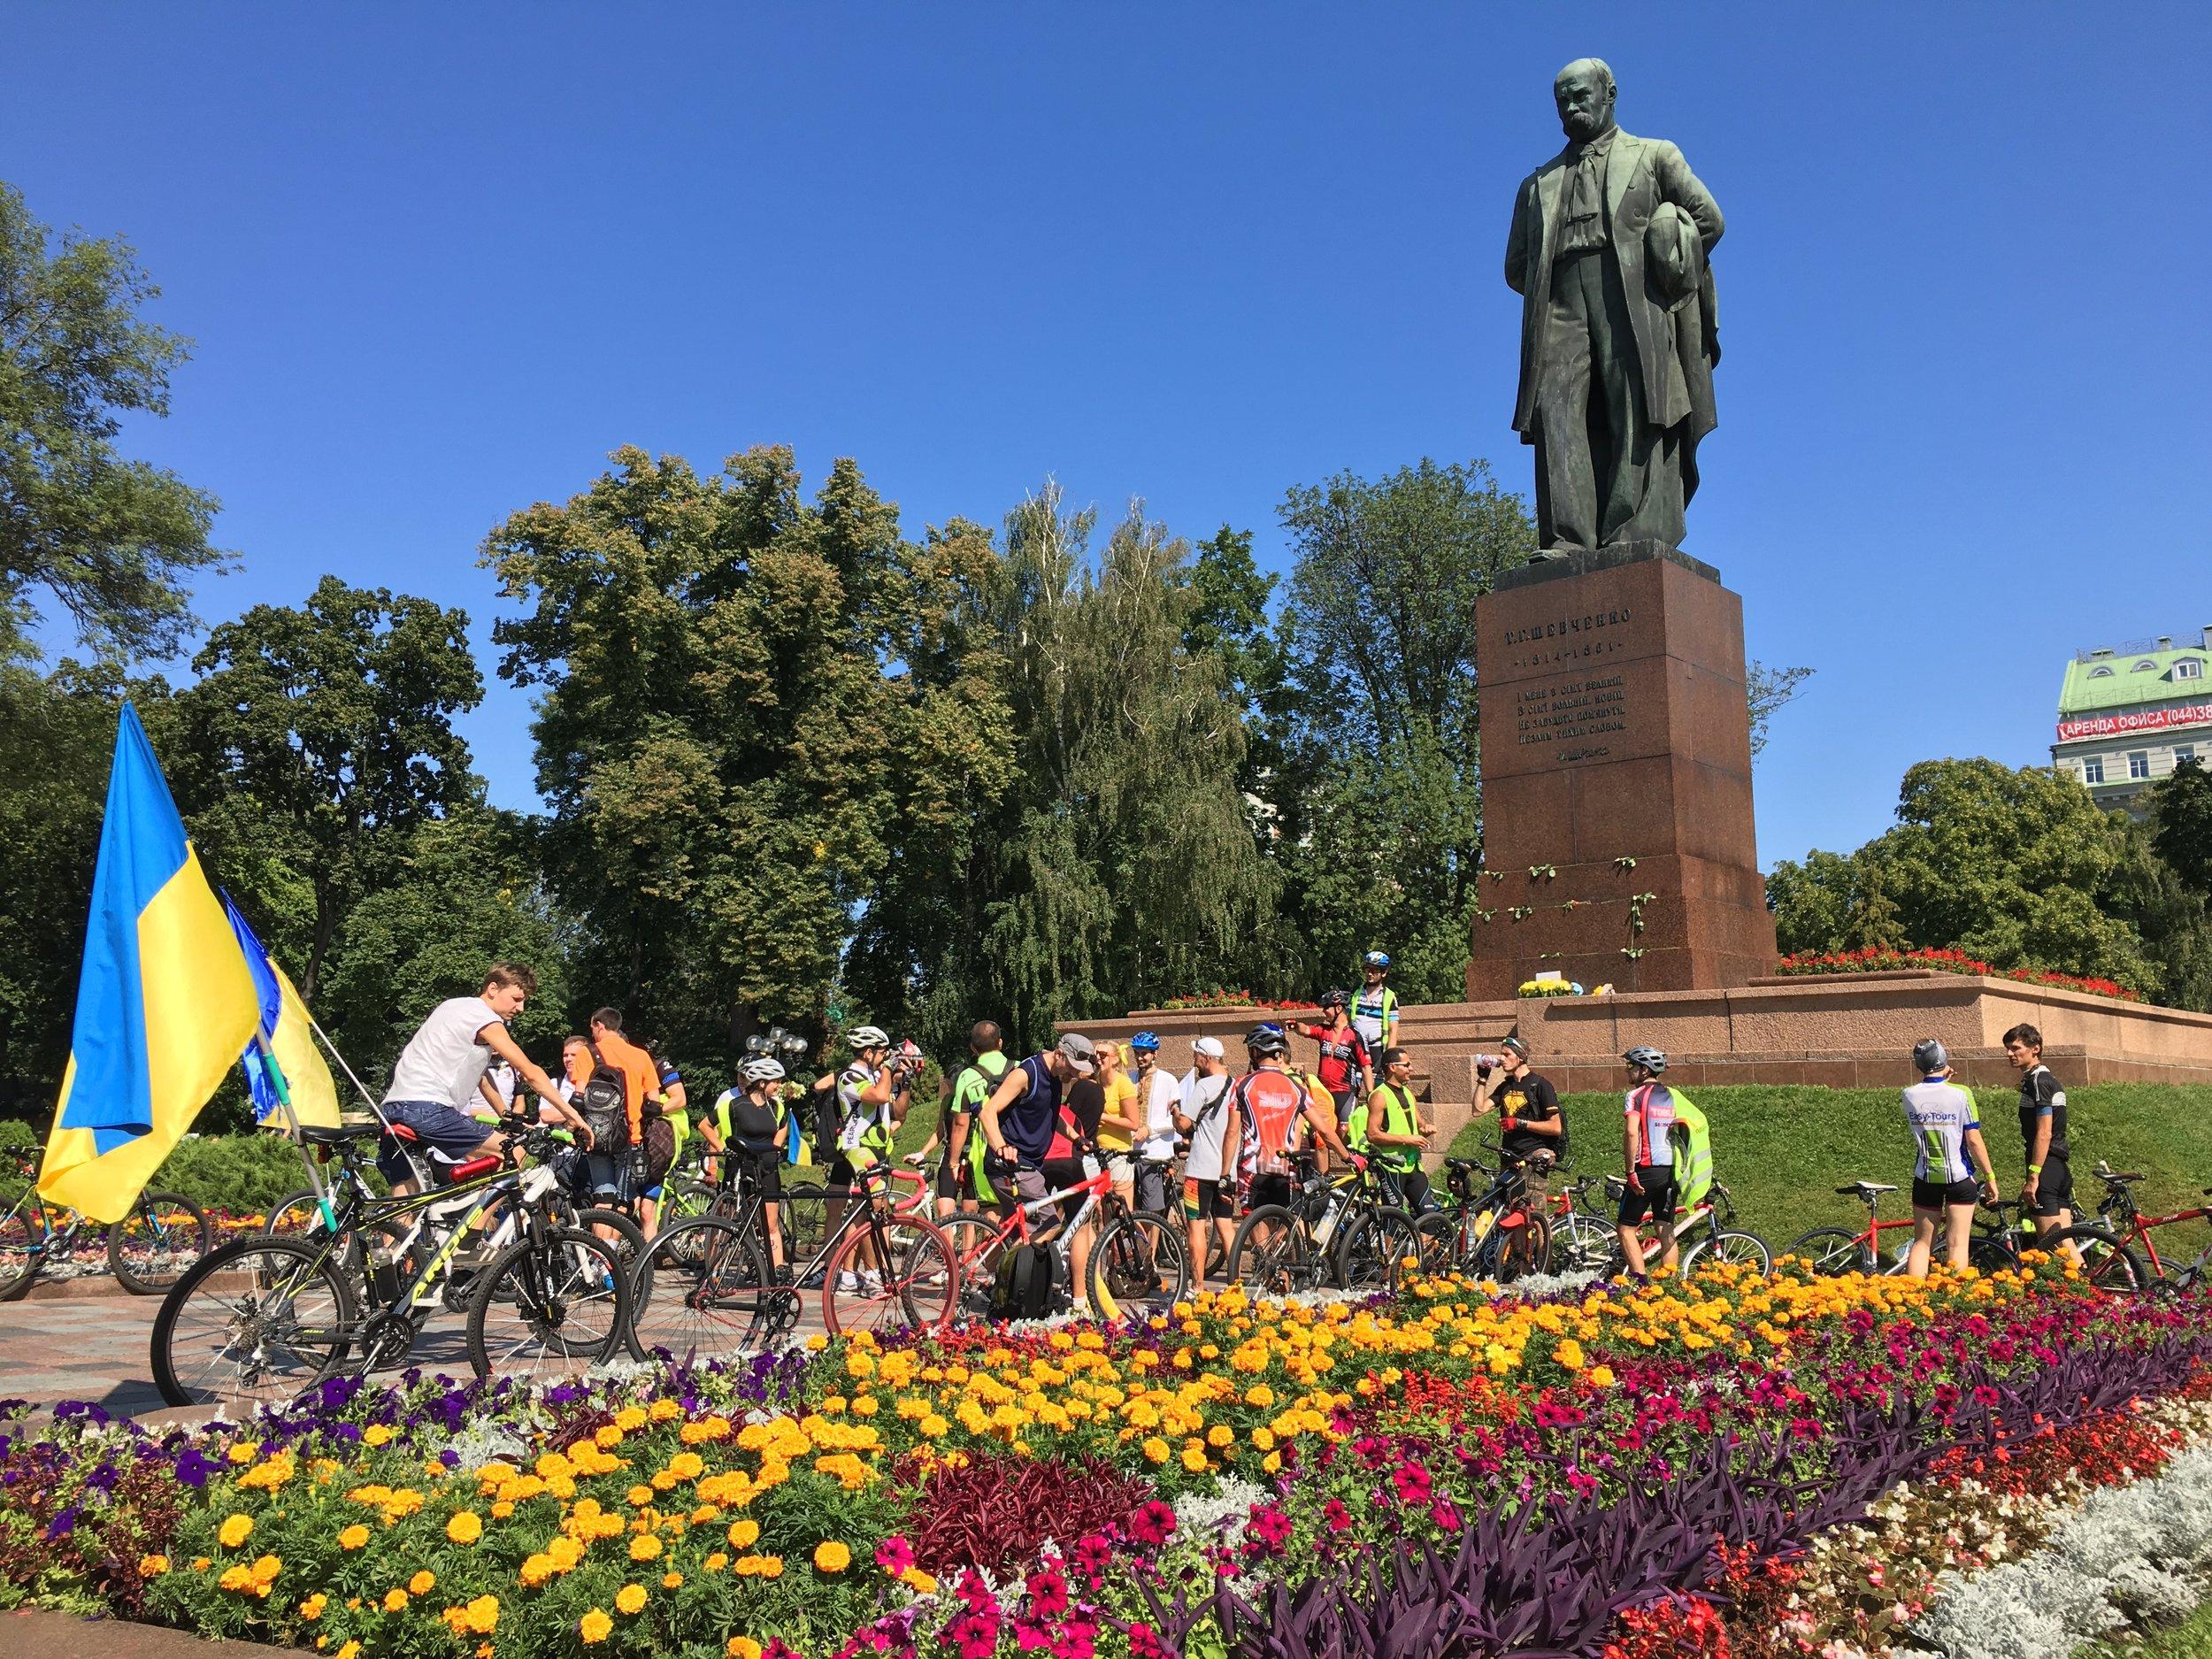 Taras Shevchenko Park in Kyiv, Ukraine